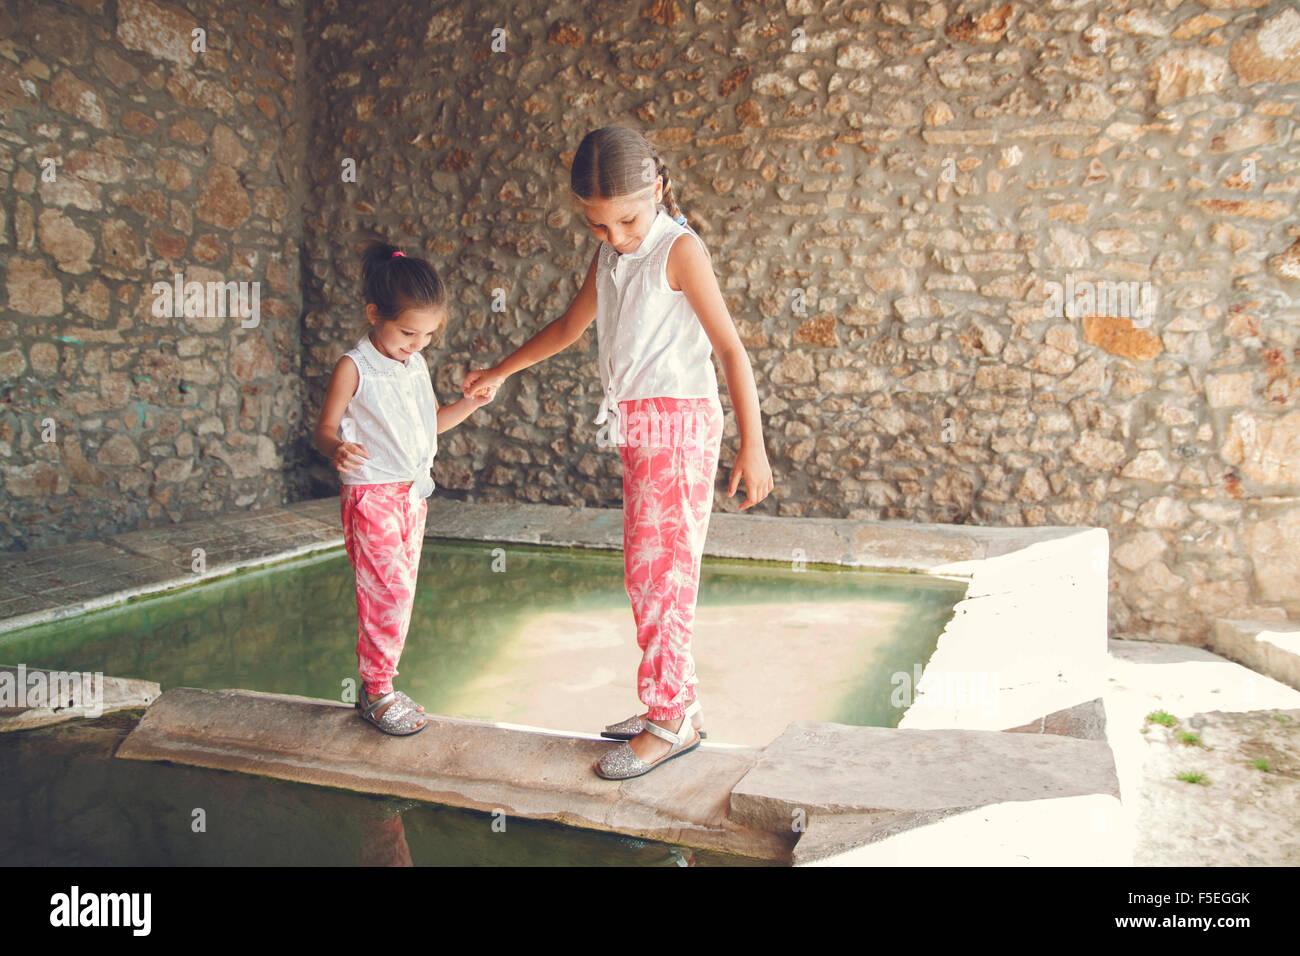 Dos chicas caminando por cornisa por una piscina de agua Imagen De Stock